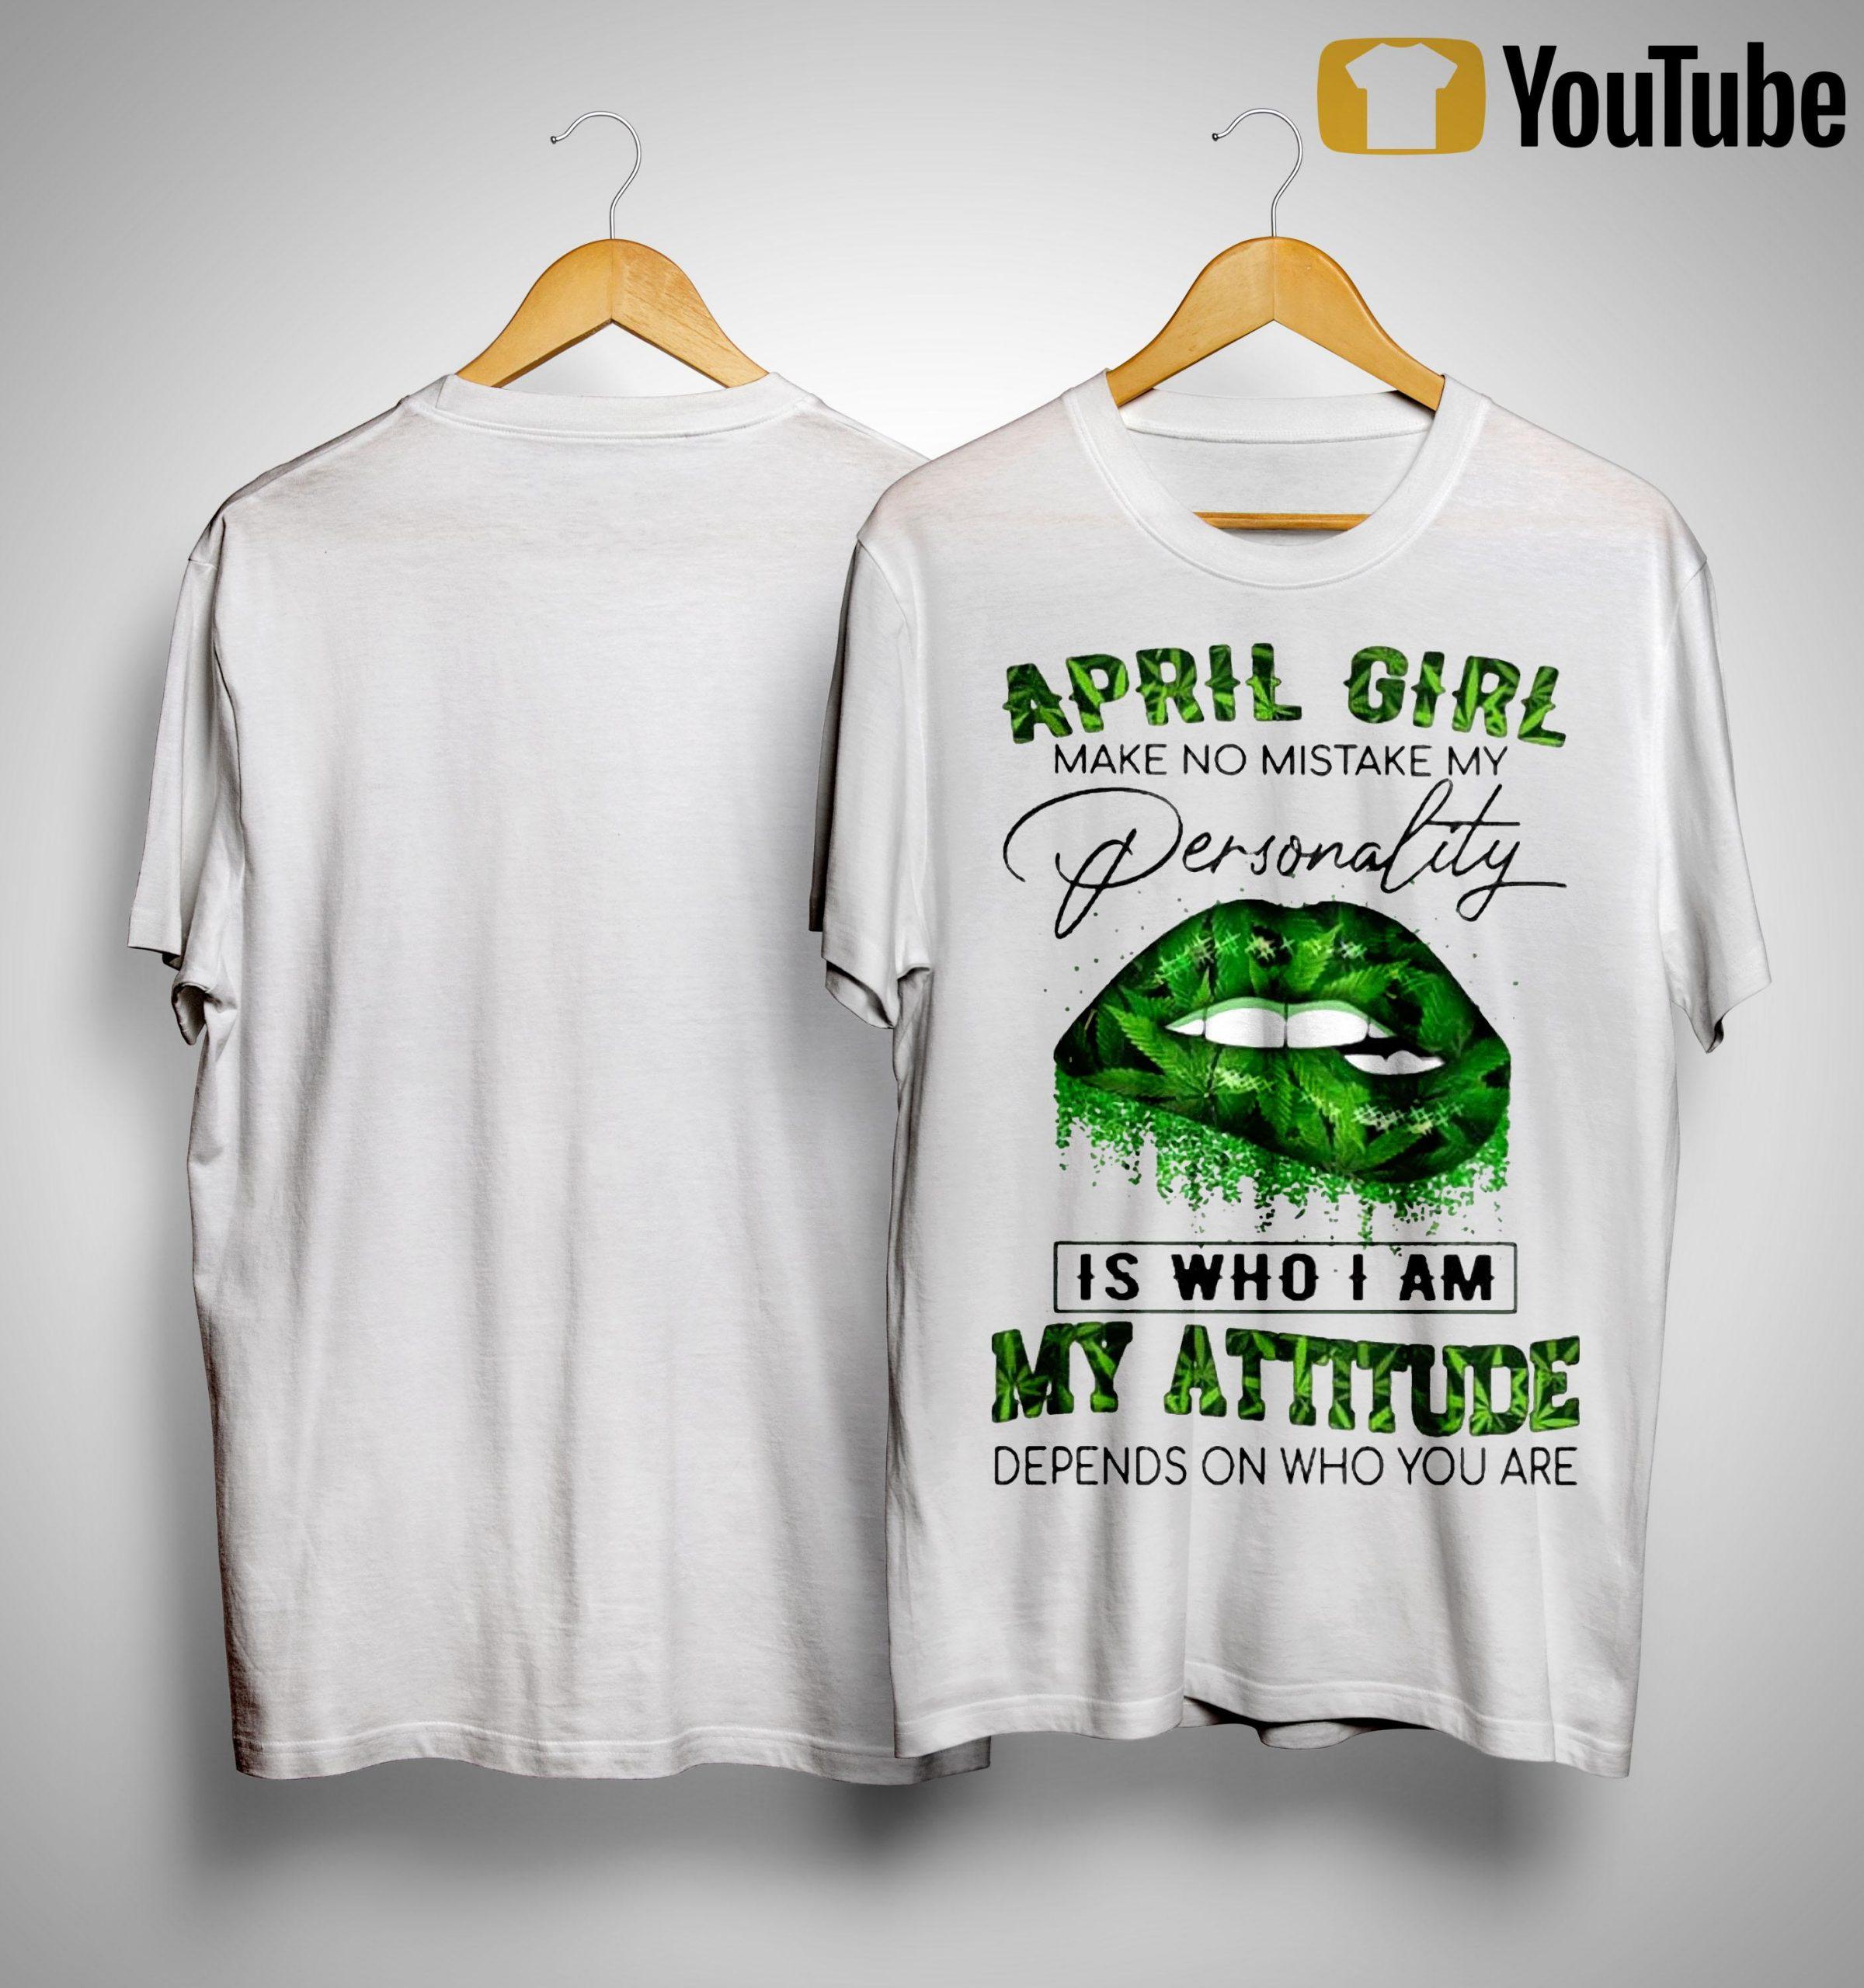 Cannabis Lips August Girl Make No Mistake My Personality My Attitude Shirt